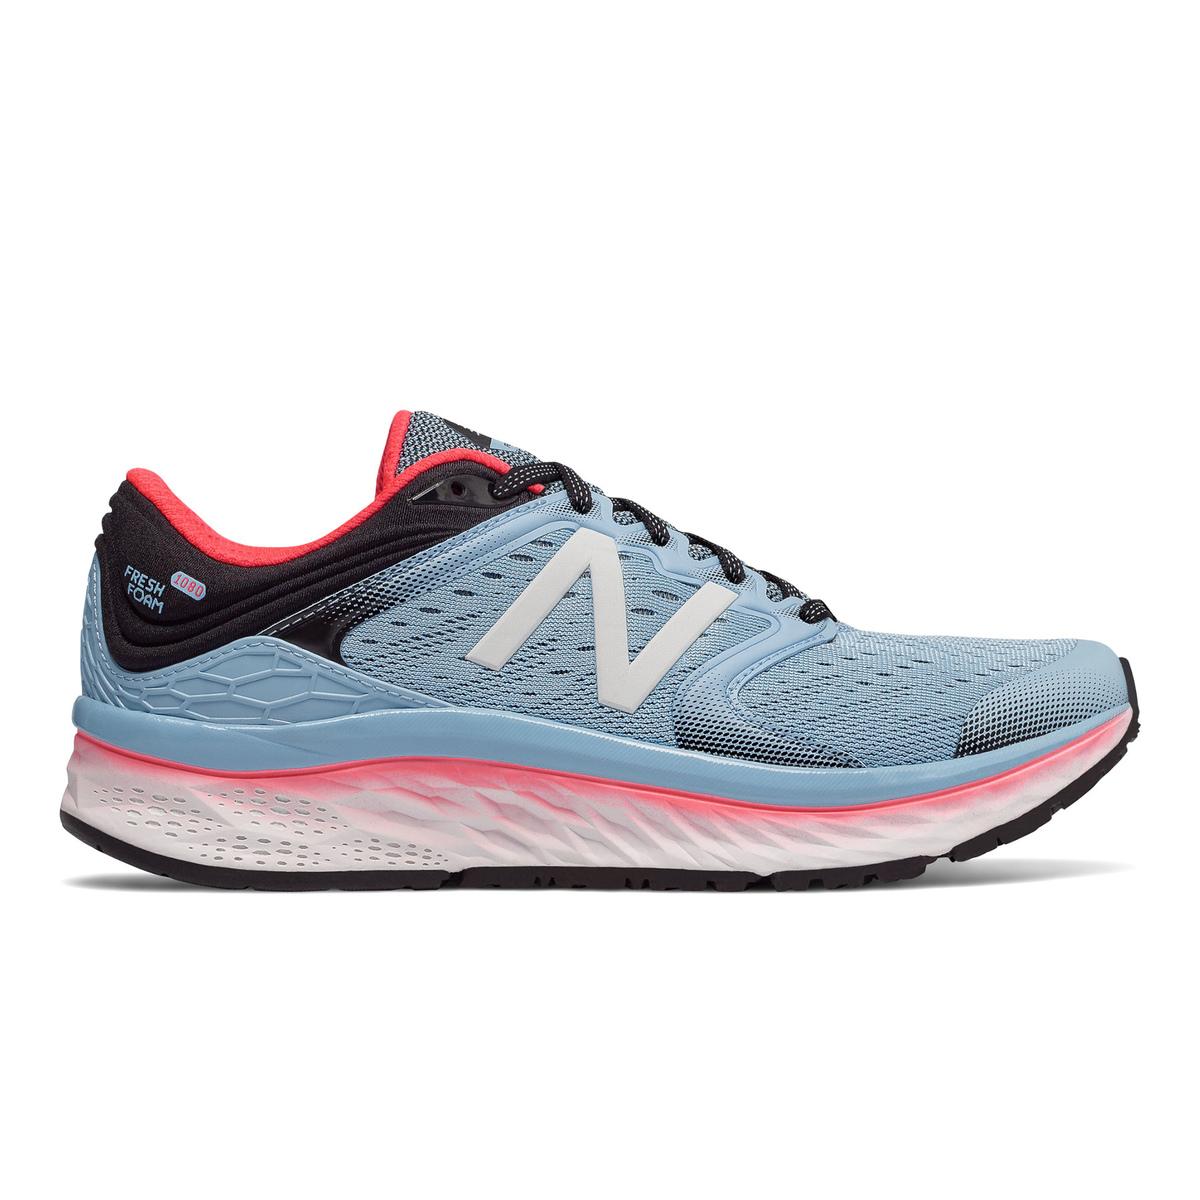 scarpe running new balance recensioni